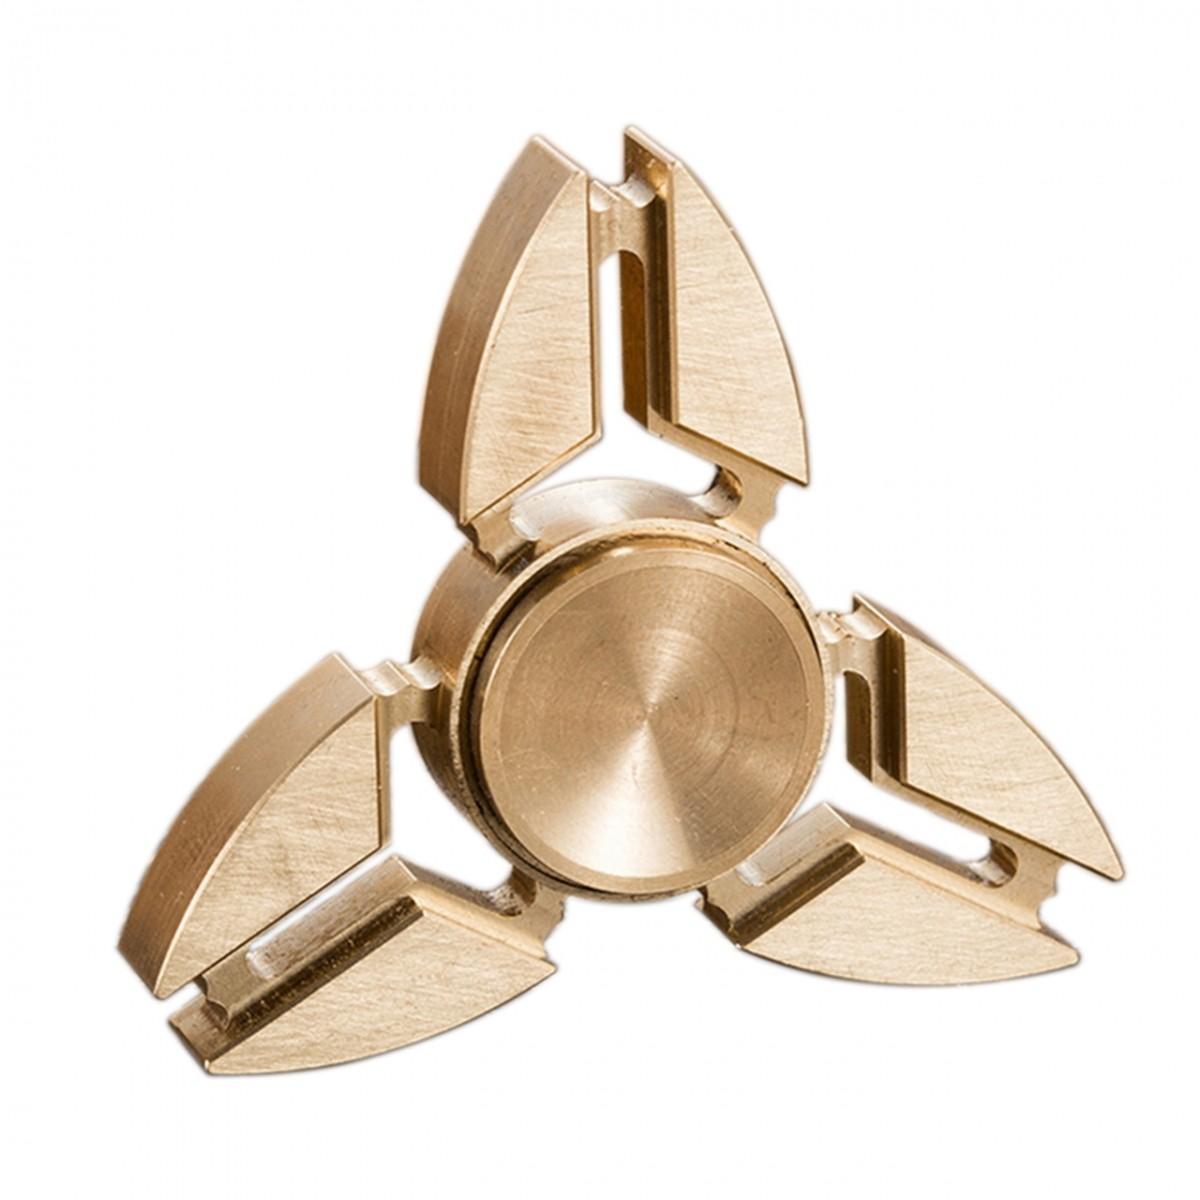 Hand Spinner de Metal Bronze - Rolamento Anti Estresse Fidget Hand Spinner